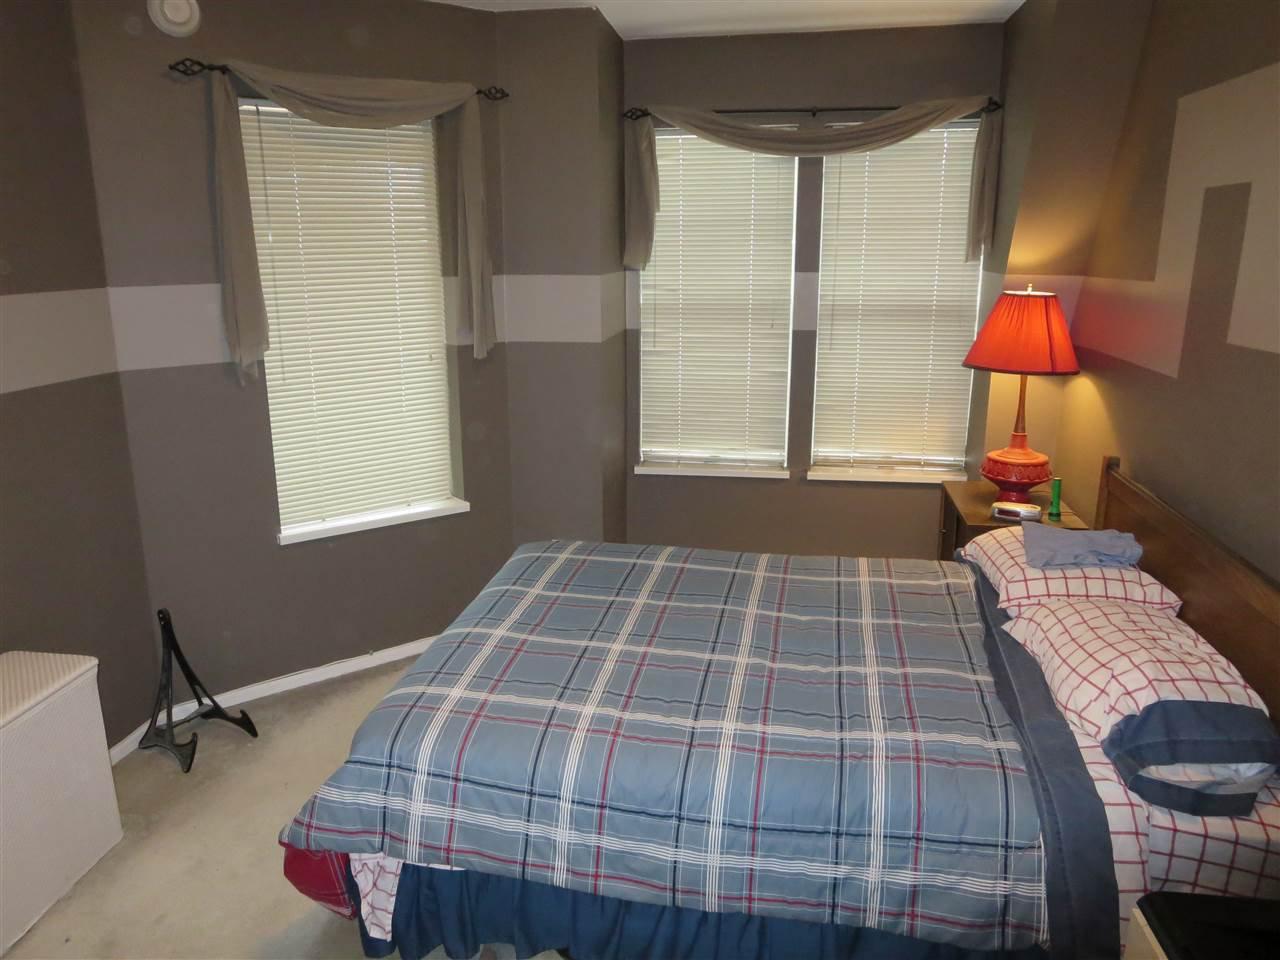 Photo 6: Photos: 317 98 LAVAL Street in Coquitlam: Maillardville Condo for sale : MLS®# R2117700